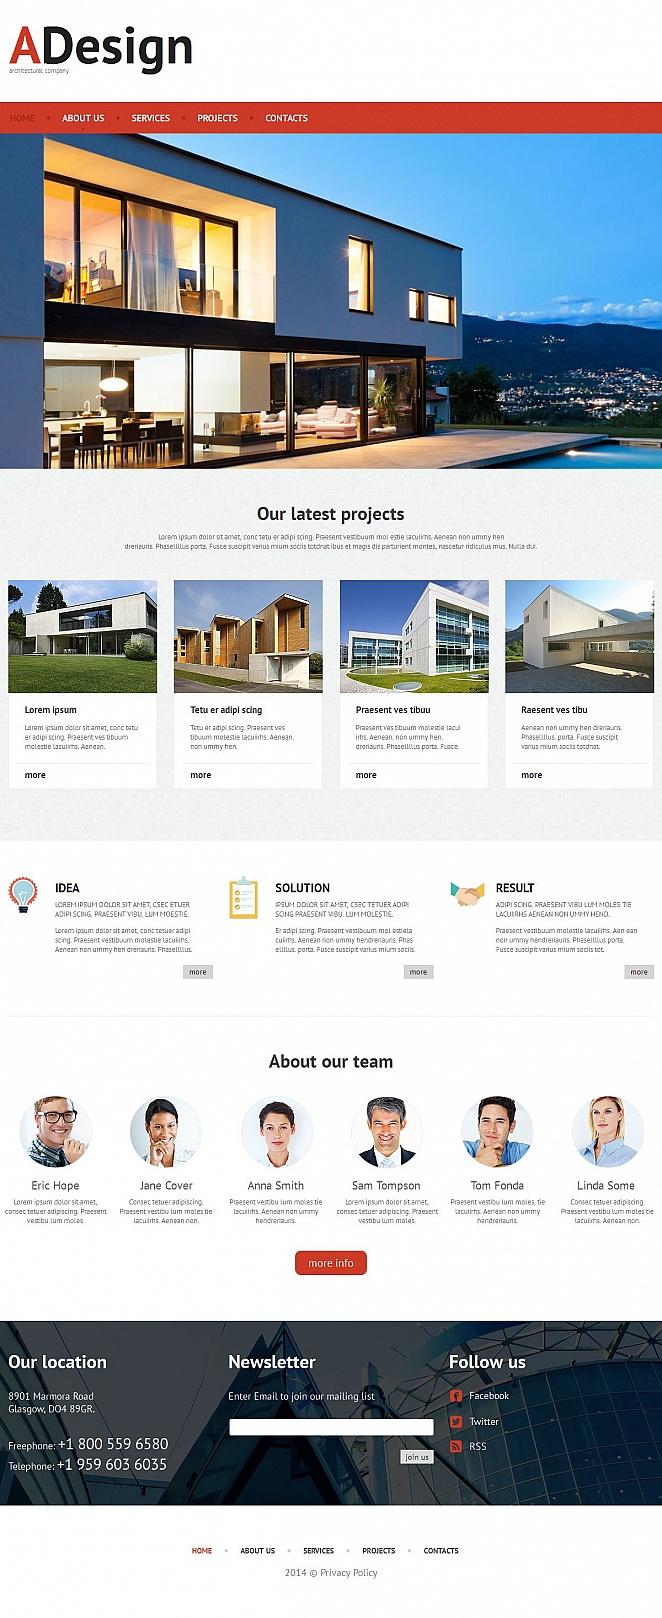 Architecture Design Website Template - image